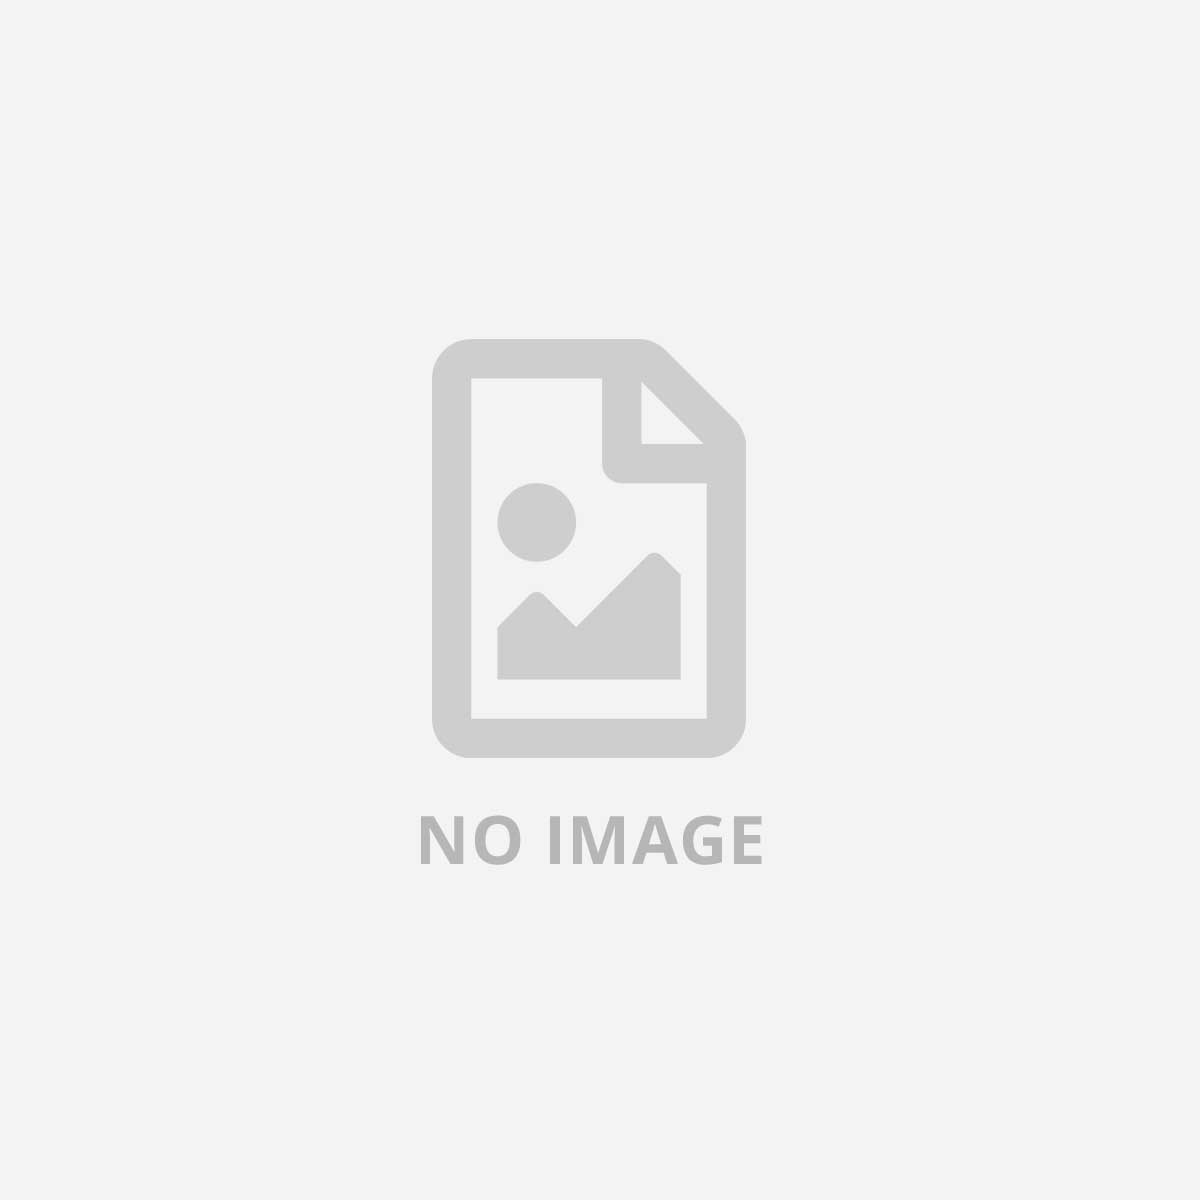 CANSON BLOCCO ACQUERELLO 14 8X21 A5